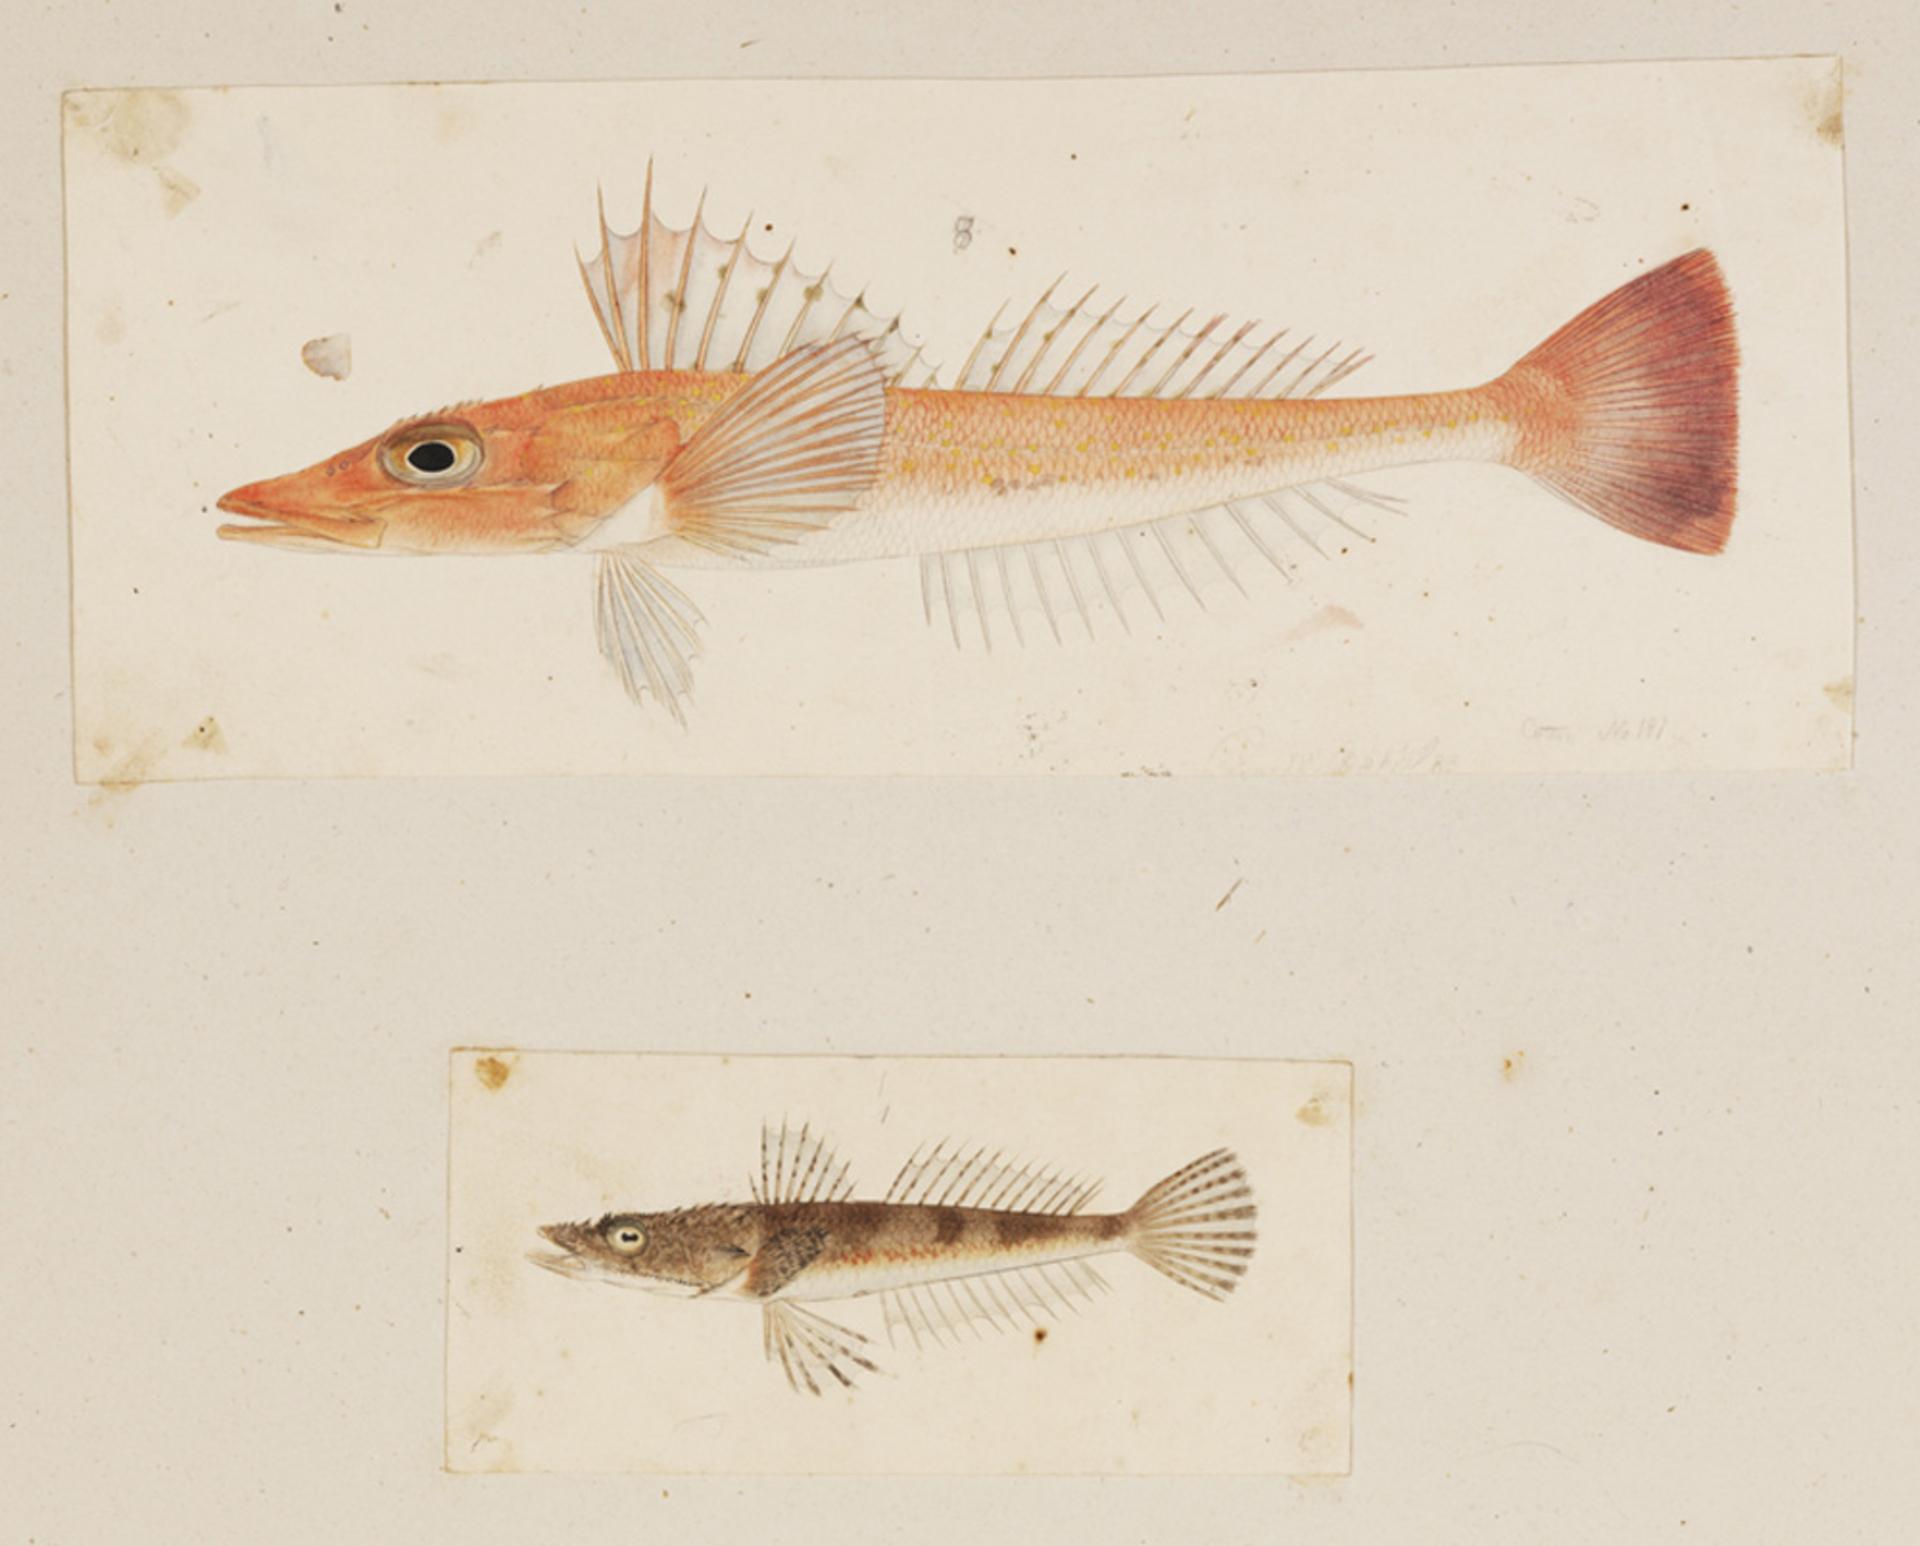 RMNH.ART.209 | Onigocia spinosa